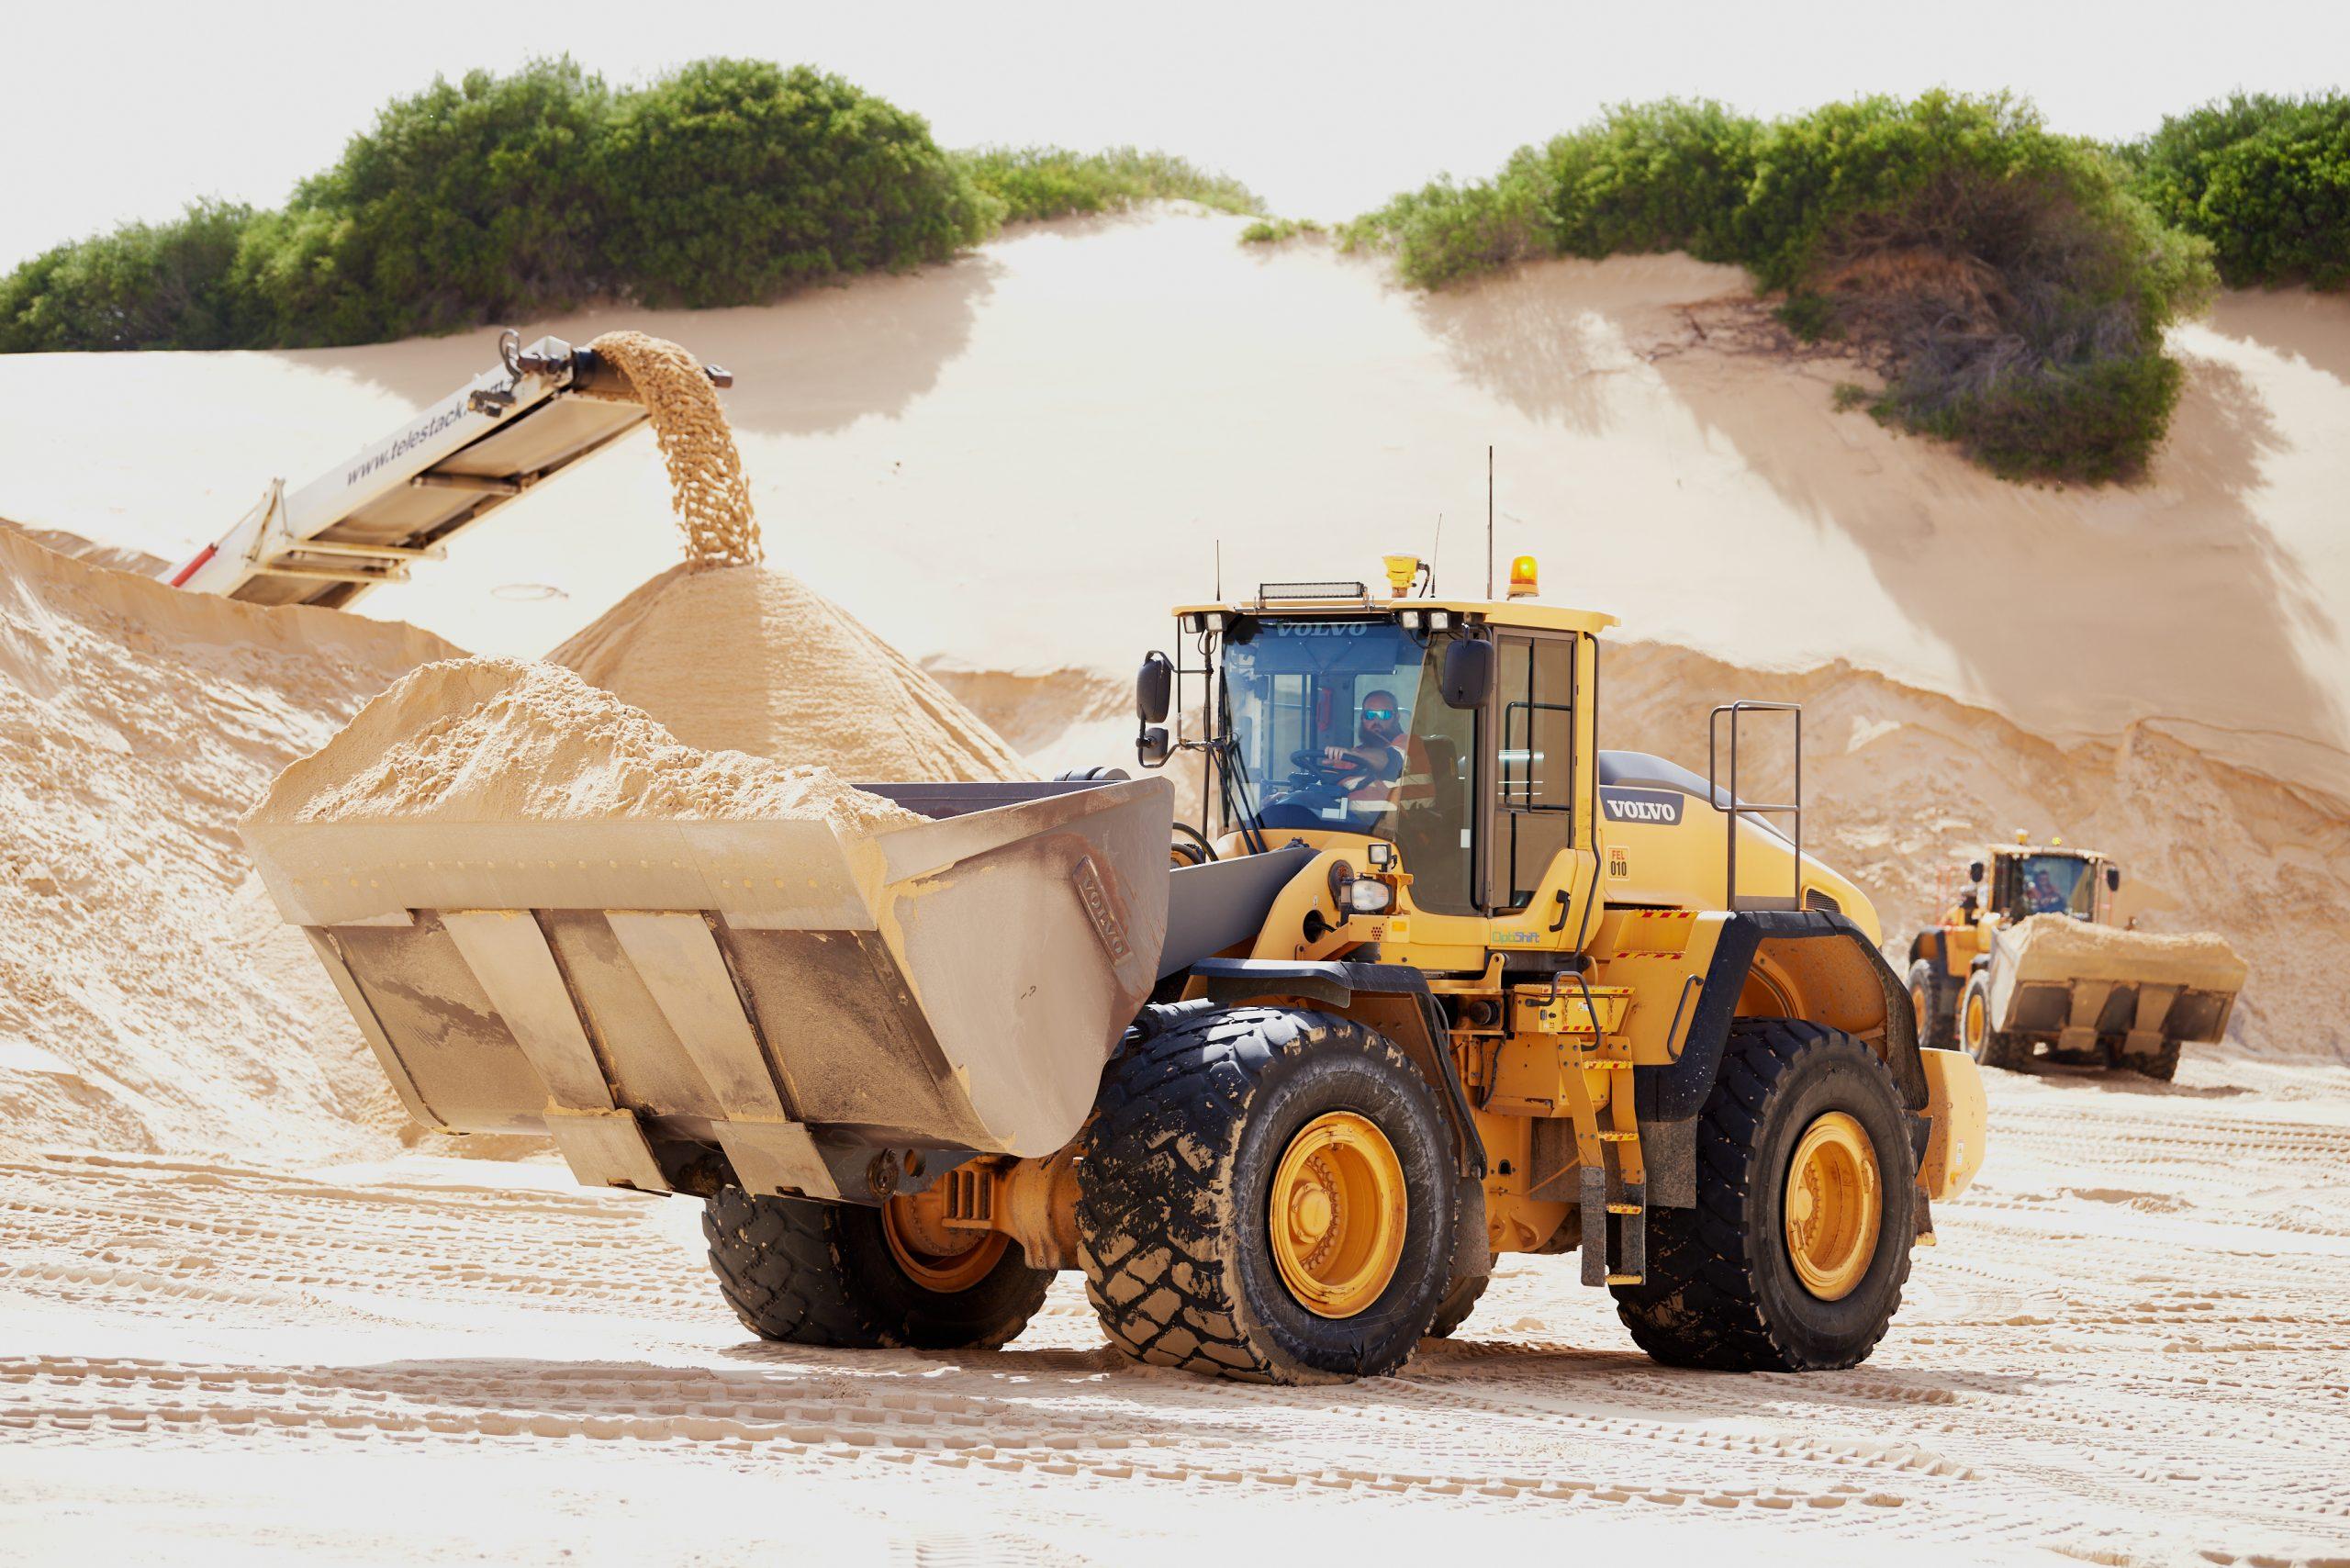 Macka's Sand & Soil Supplies and CJD Equipment 5